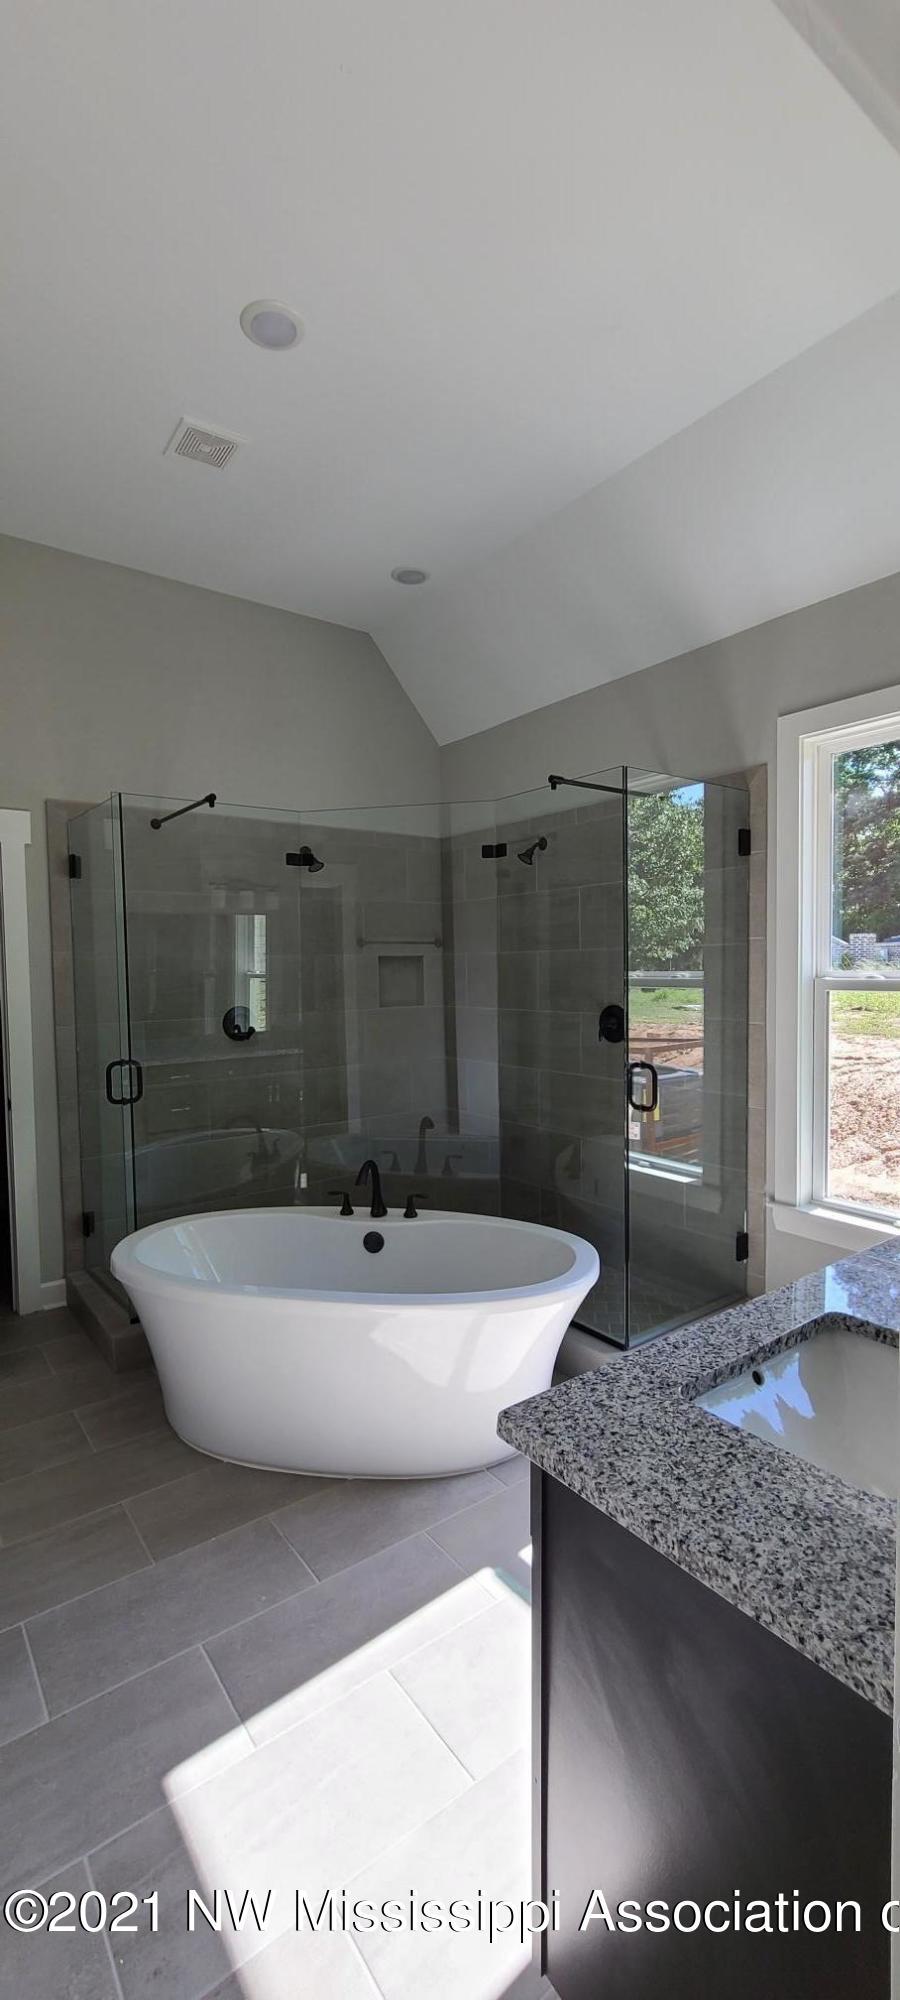 Upgraded Soaker Tub